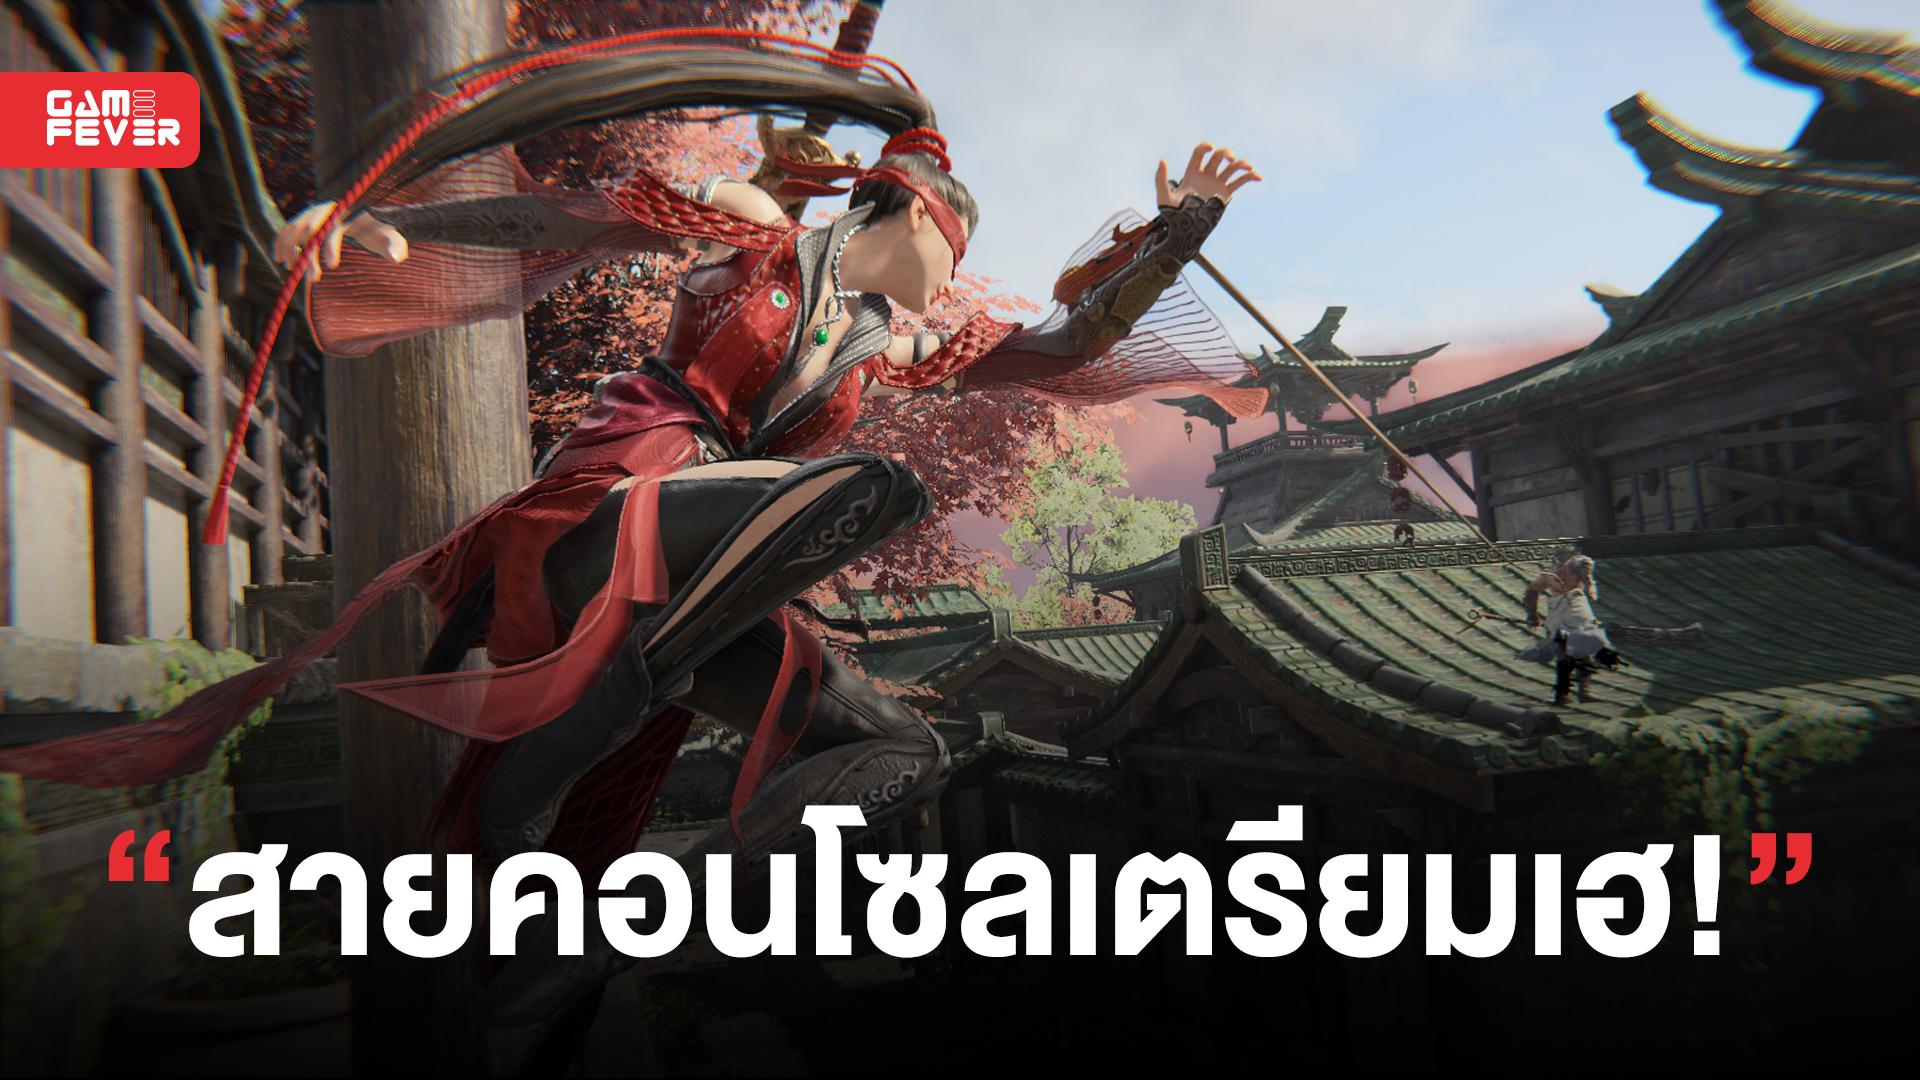 Naraka: Bladepoint เผยฟุตเทจเกมเพลย์บน PS5 ก่อนวางขายบน PC ในเดือนสิงหาคม